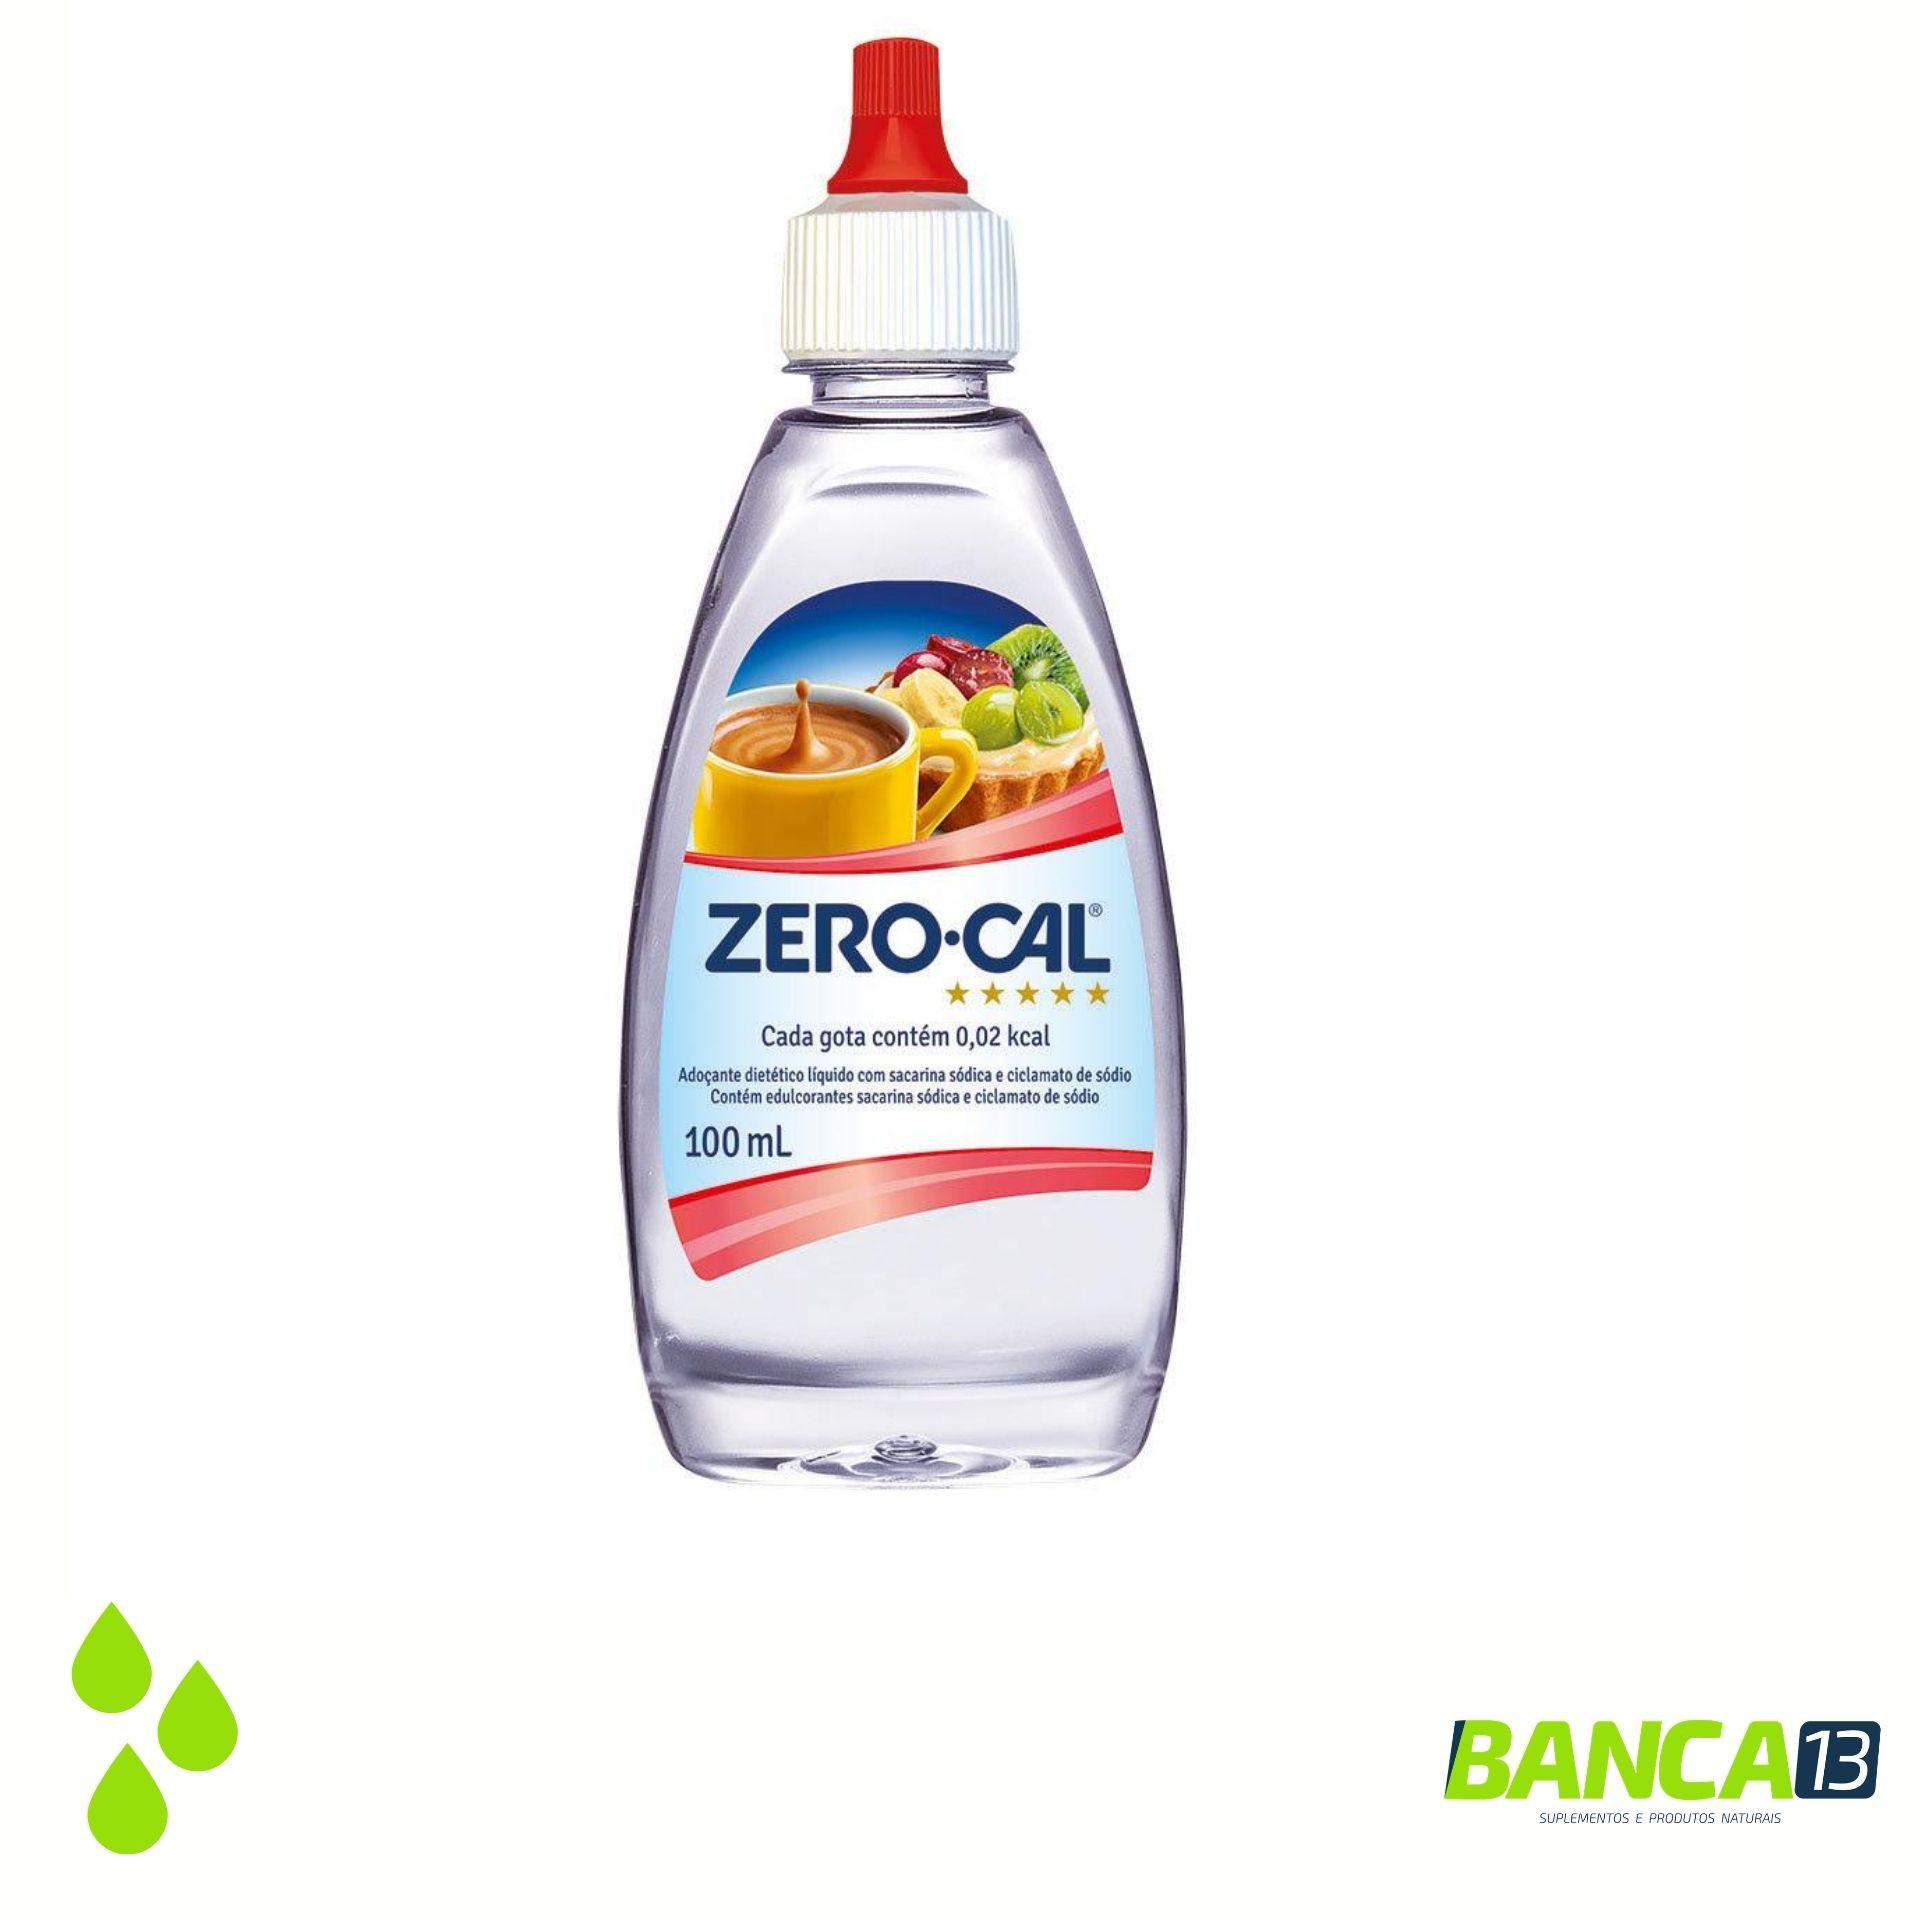 ZERO-CAL 100ML